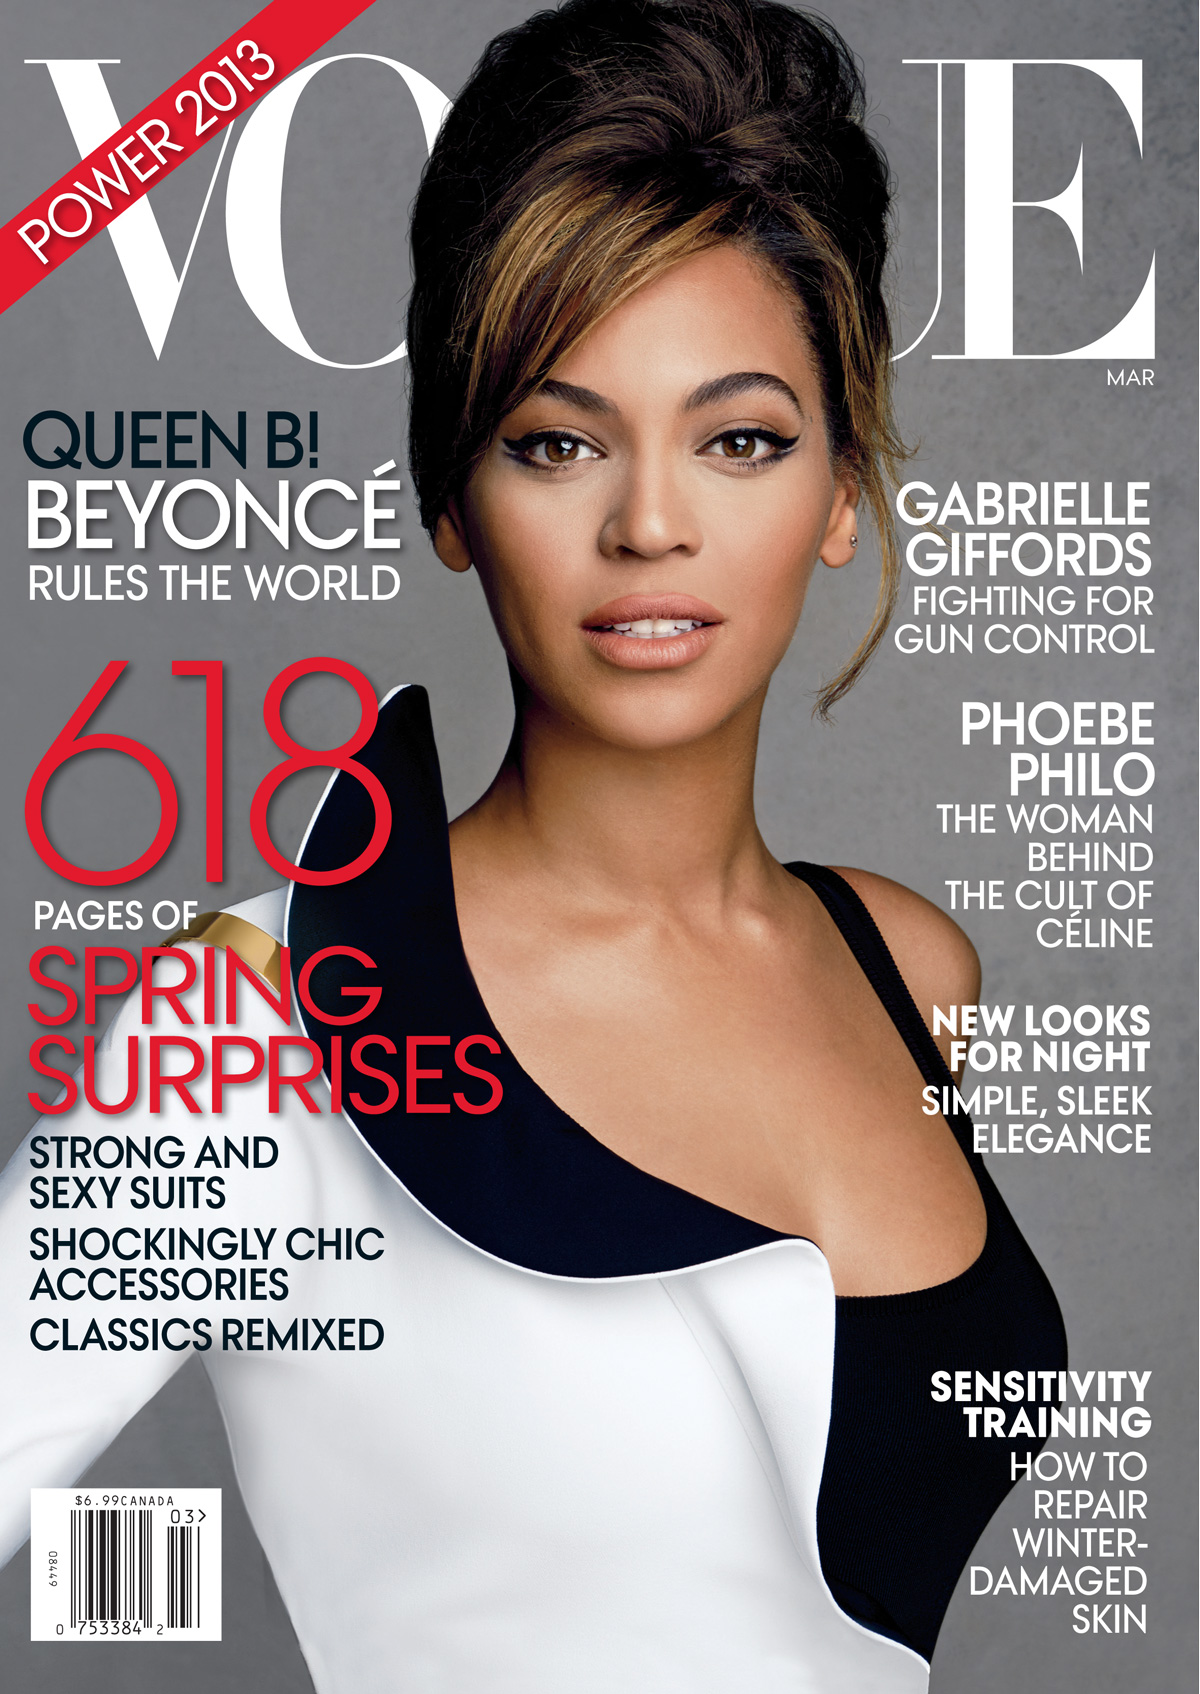 Ten Top Fashion Magazines | The Fashion Foot